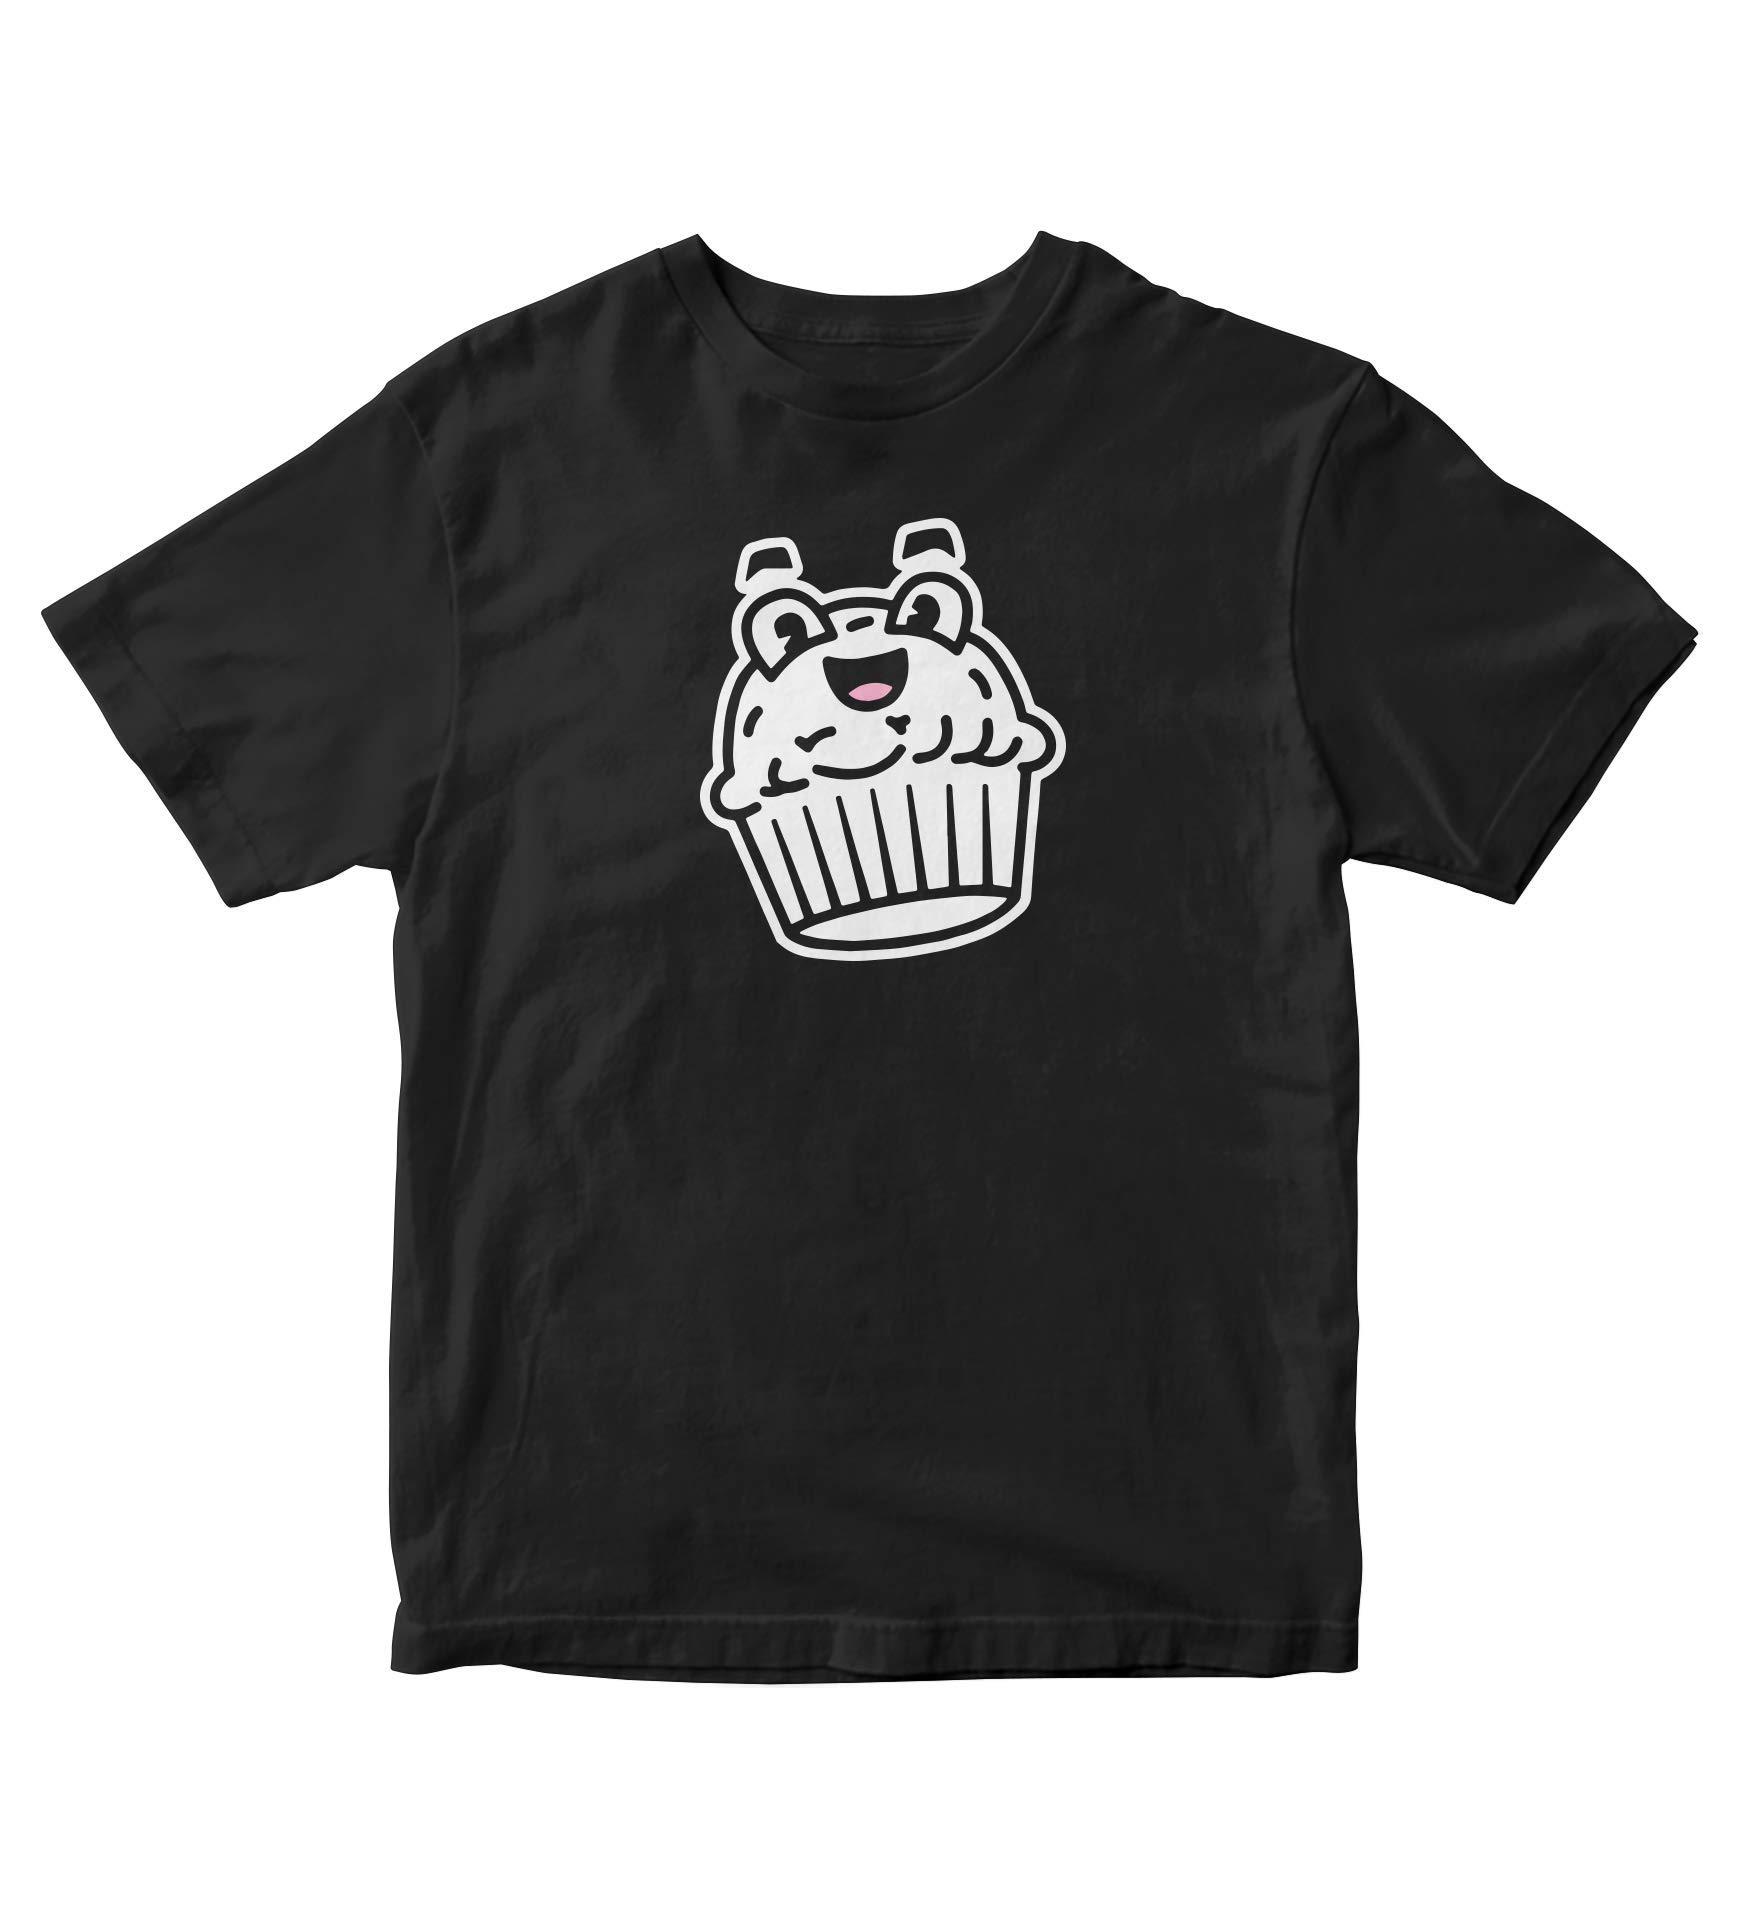 Tjsports Kawaii Cupcake Shirt Kuchen Geburtstag Anime Manga Black Shirt Adult S A720